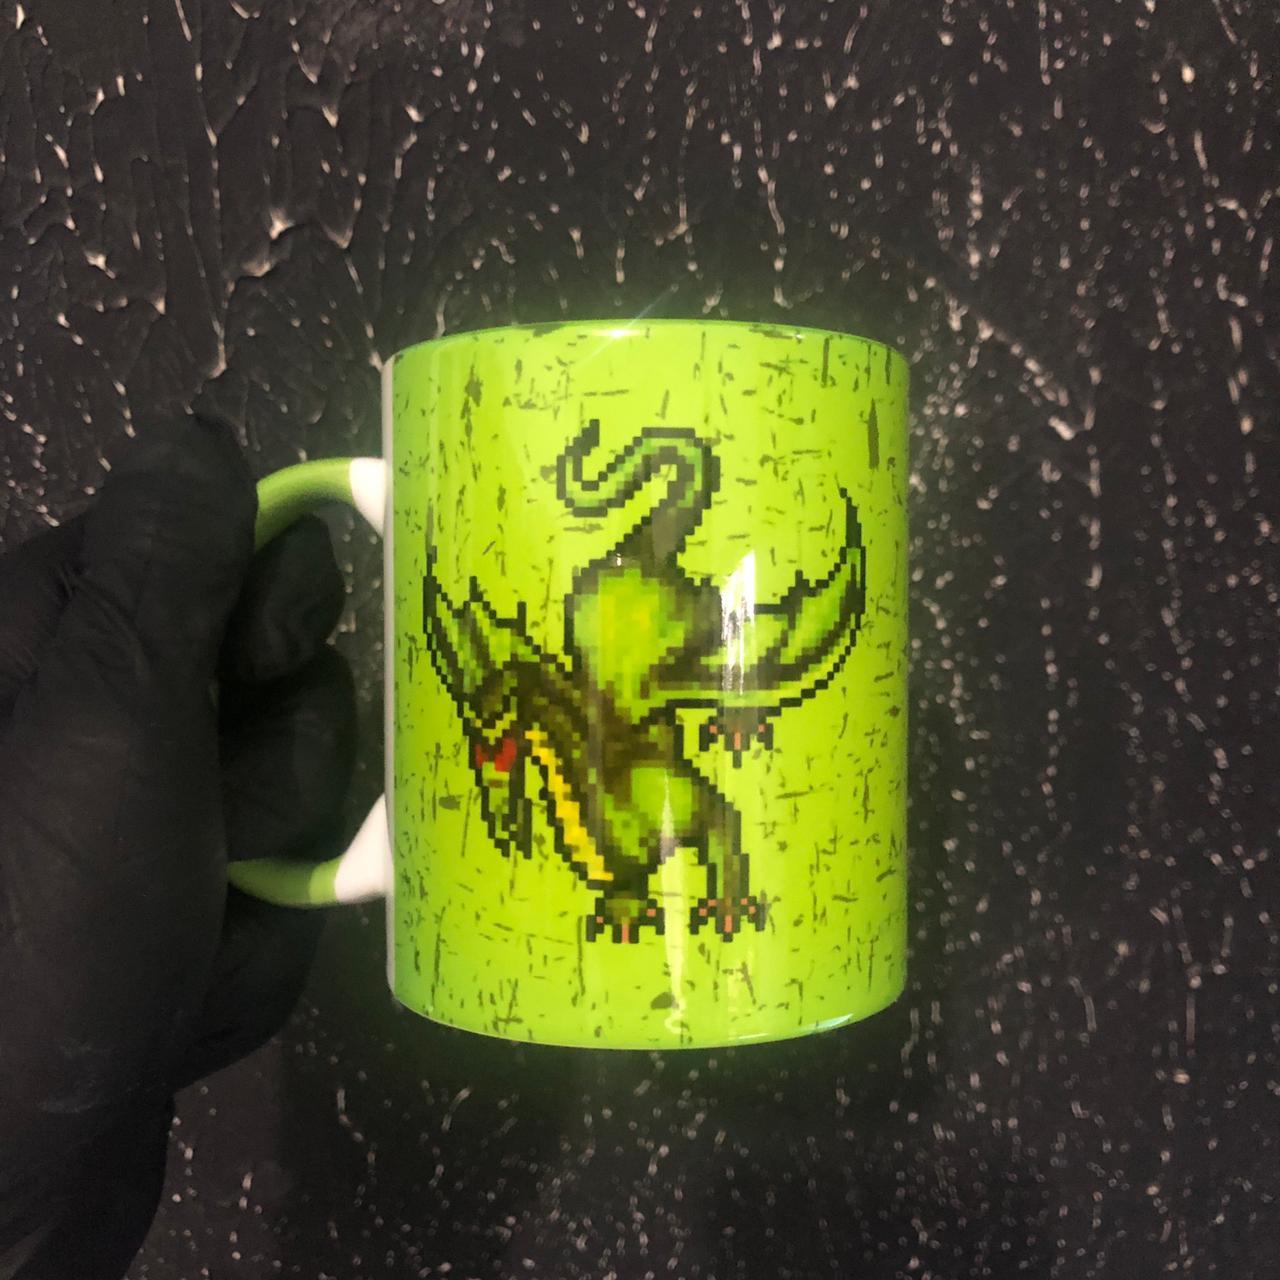 Caneca Geek Love Tibia - Dragon